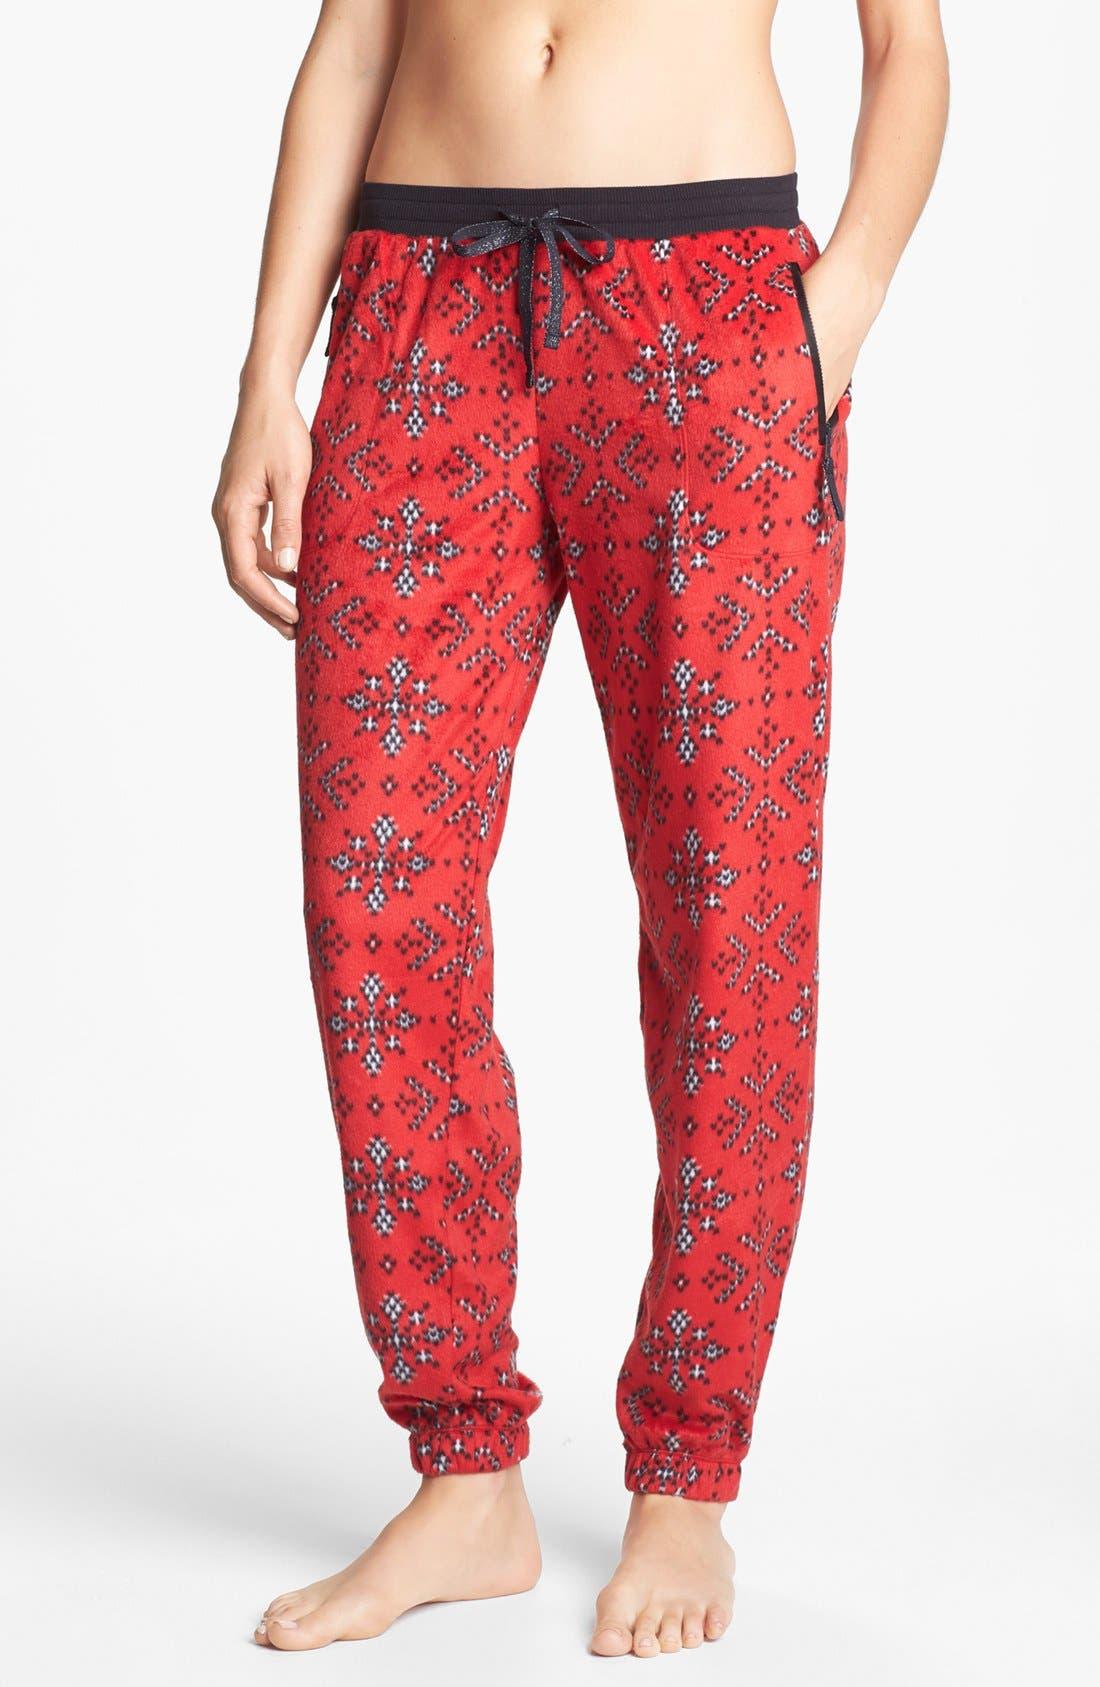 Main Image - kensie 'Chilled Out' Fleece Ski Pajama Pants